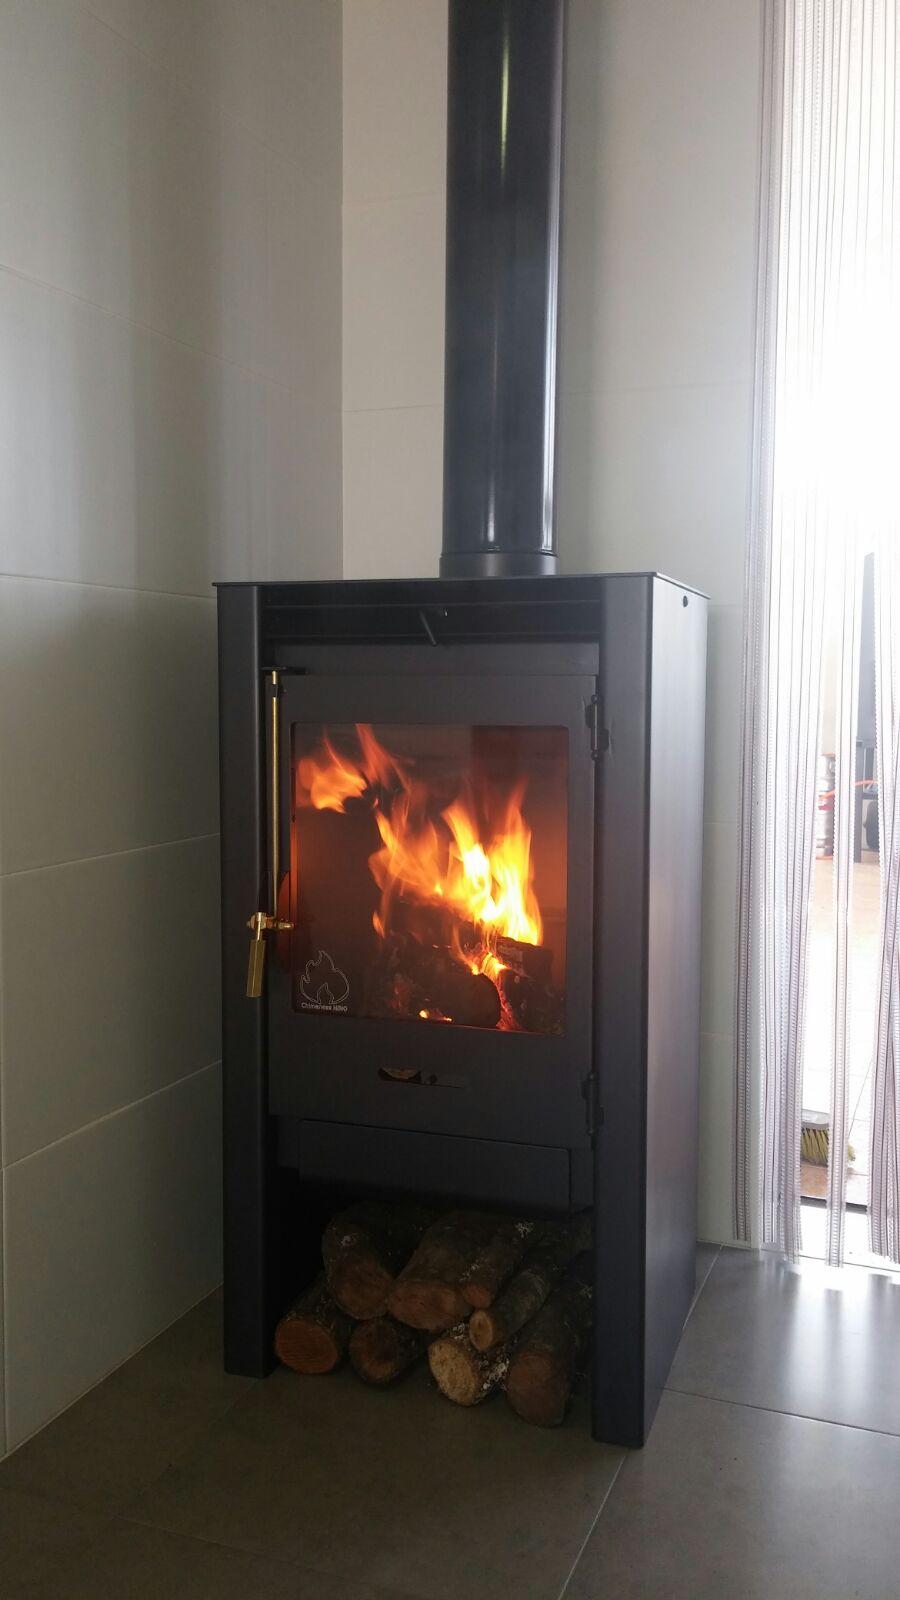 Estufas chimeneas hornos en molina de segura murcia for Estufa hogar moderna